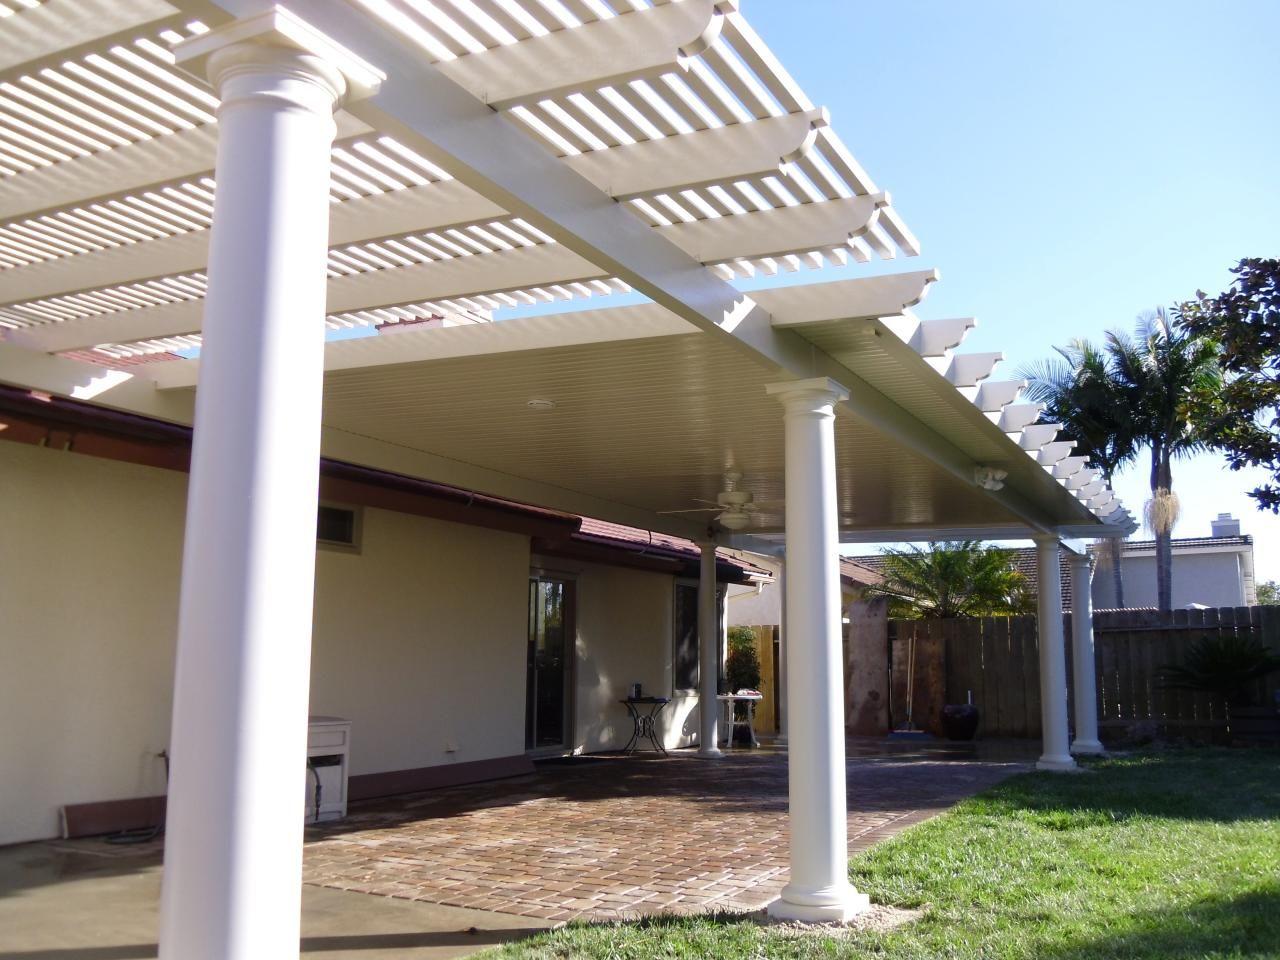 Combination Open Lattice Solid Alumawood Patio Cover Oceanside – Lattice Patio Cover Plans